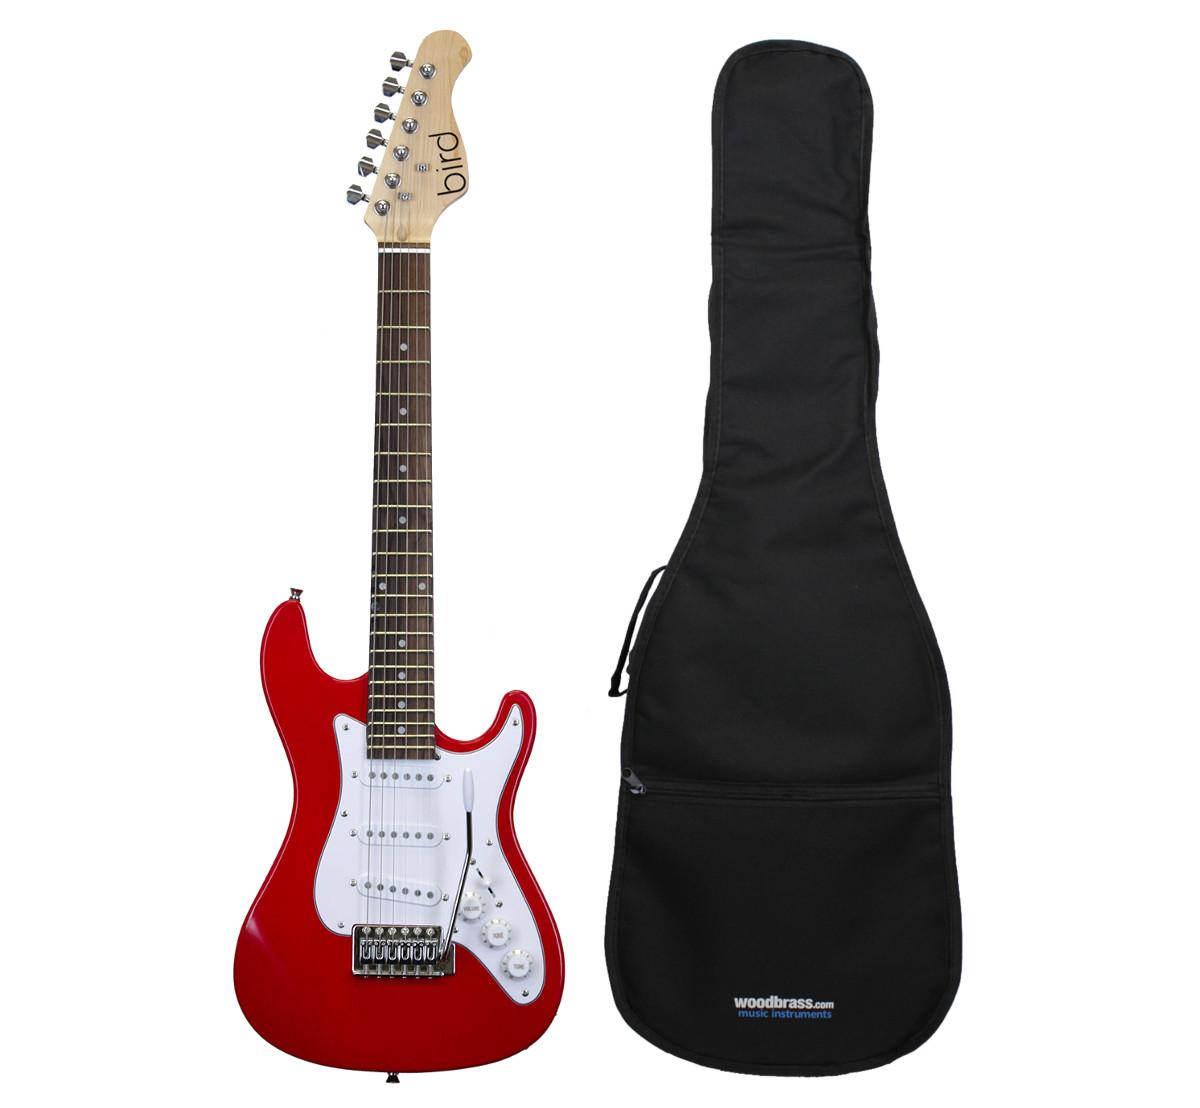 Bird Instruments Pack Stc20 Mini Red + Egb10s